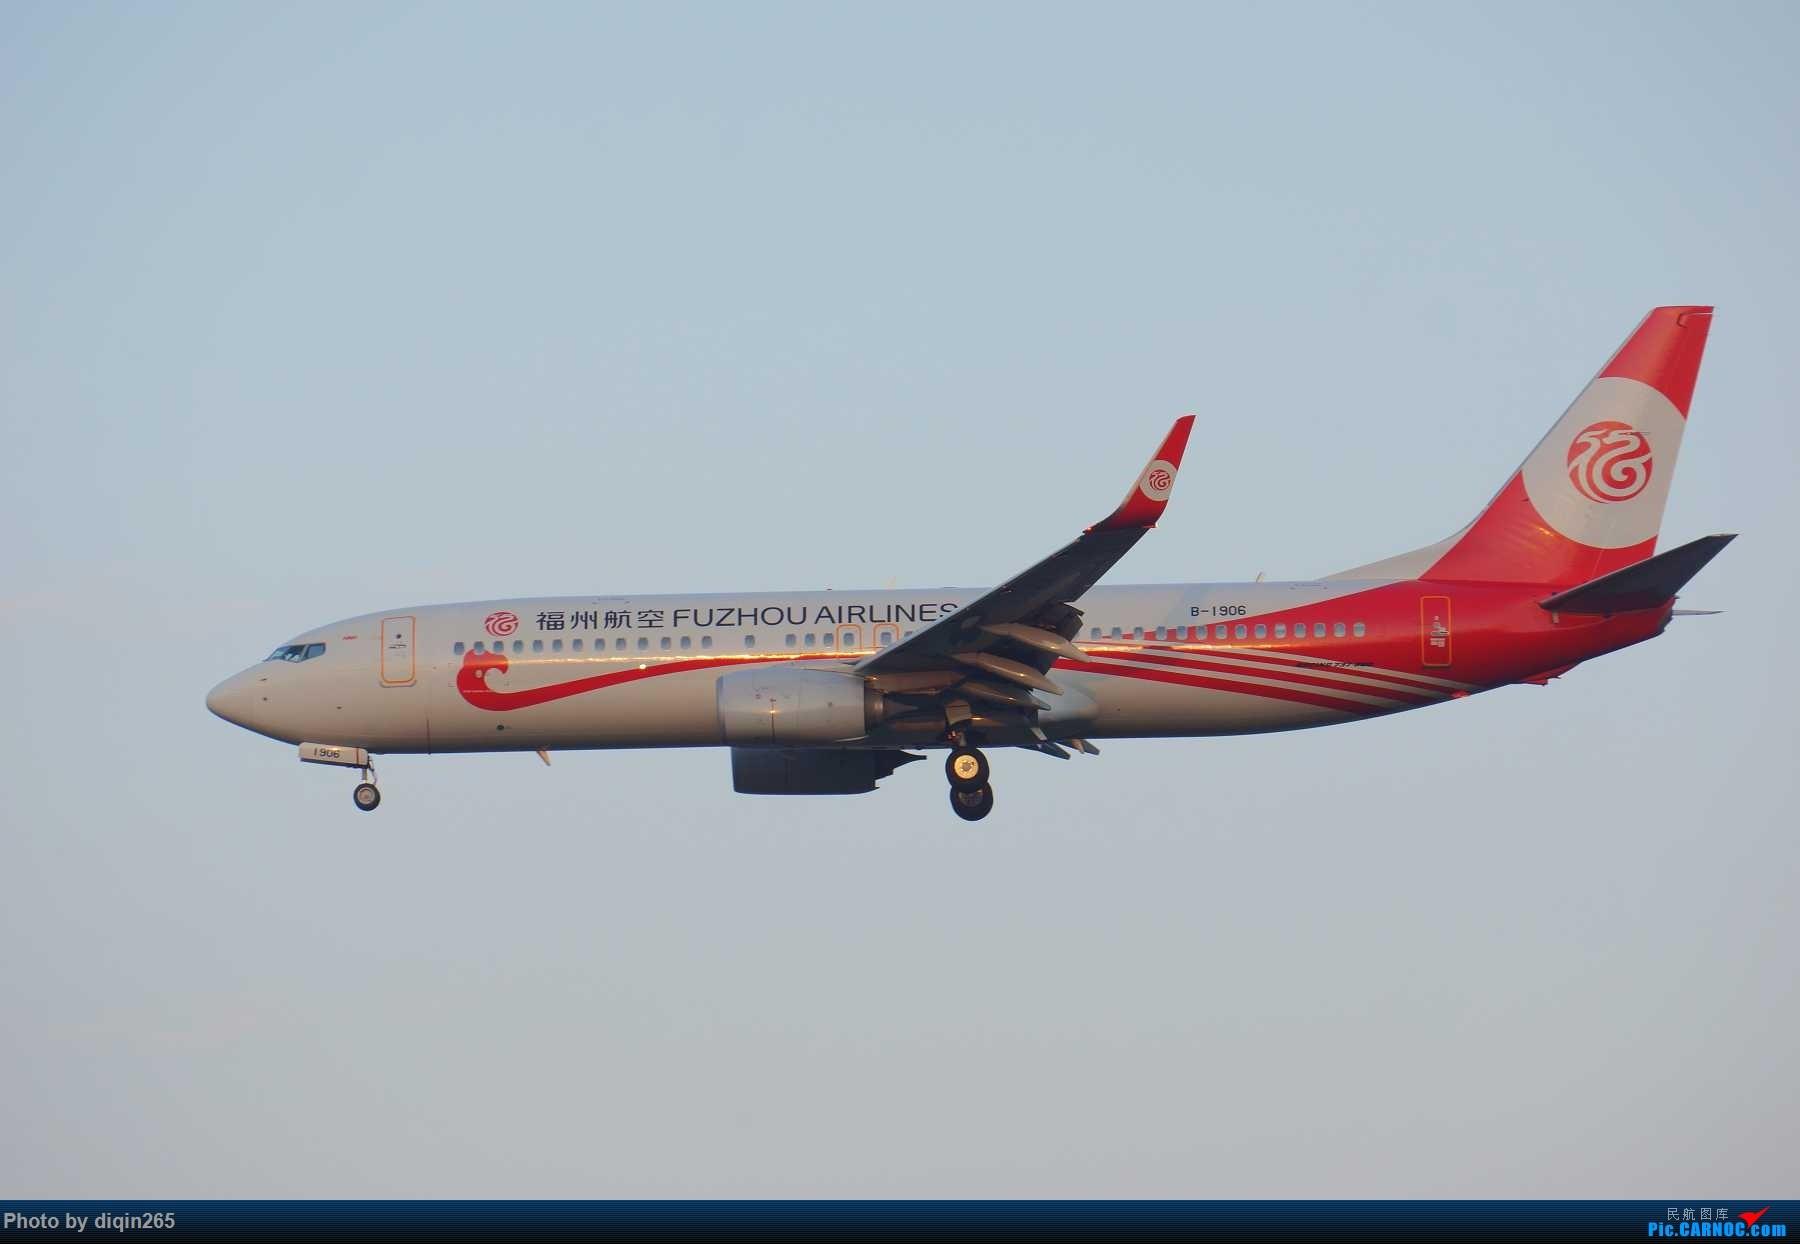 Re:[原创]CKG最近几天拍机现状:天气好 人受罪 心敞亮 BOEING 737-800 B-1906 中国重庆江北国际机场